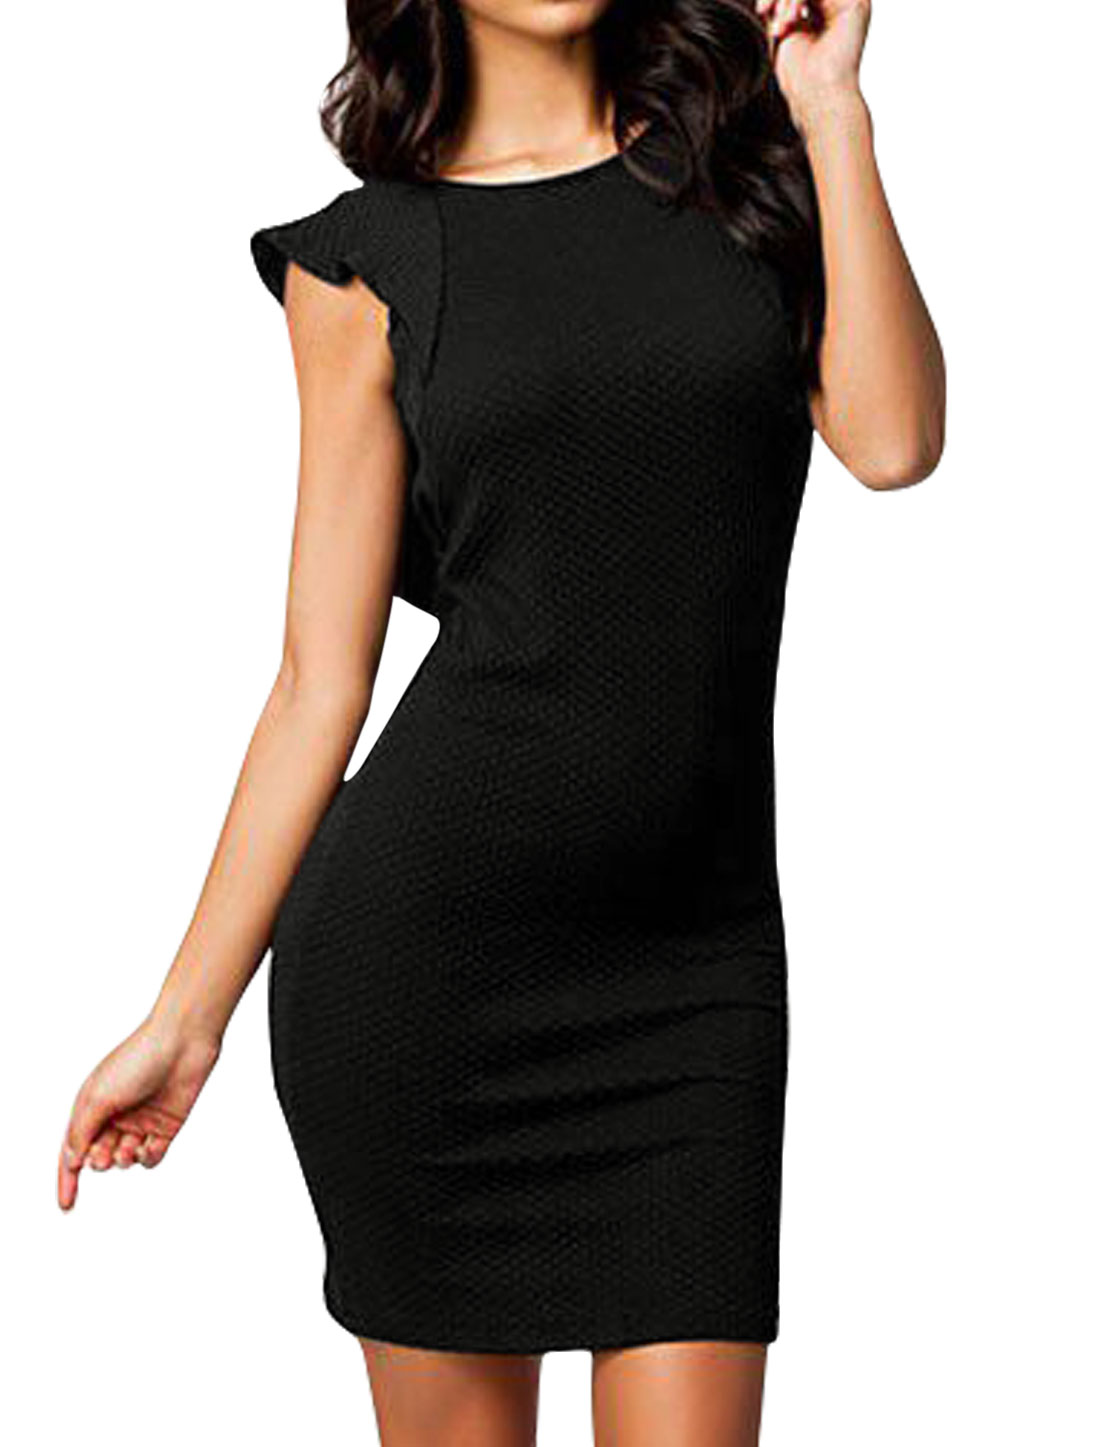 Women Sleeveless Open Back Ruffles Decor Bodycon Dress Black L